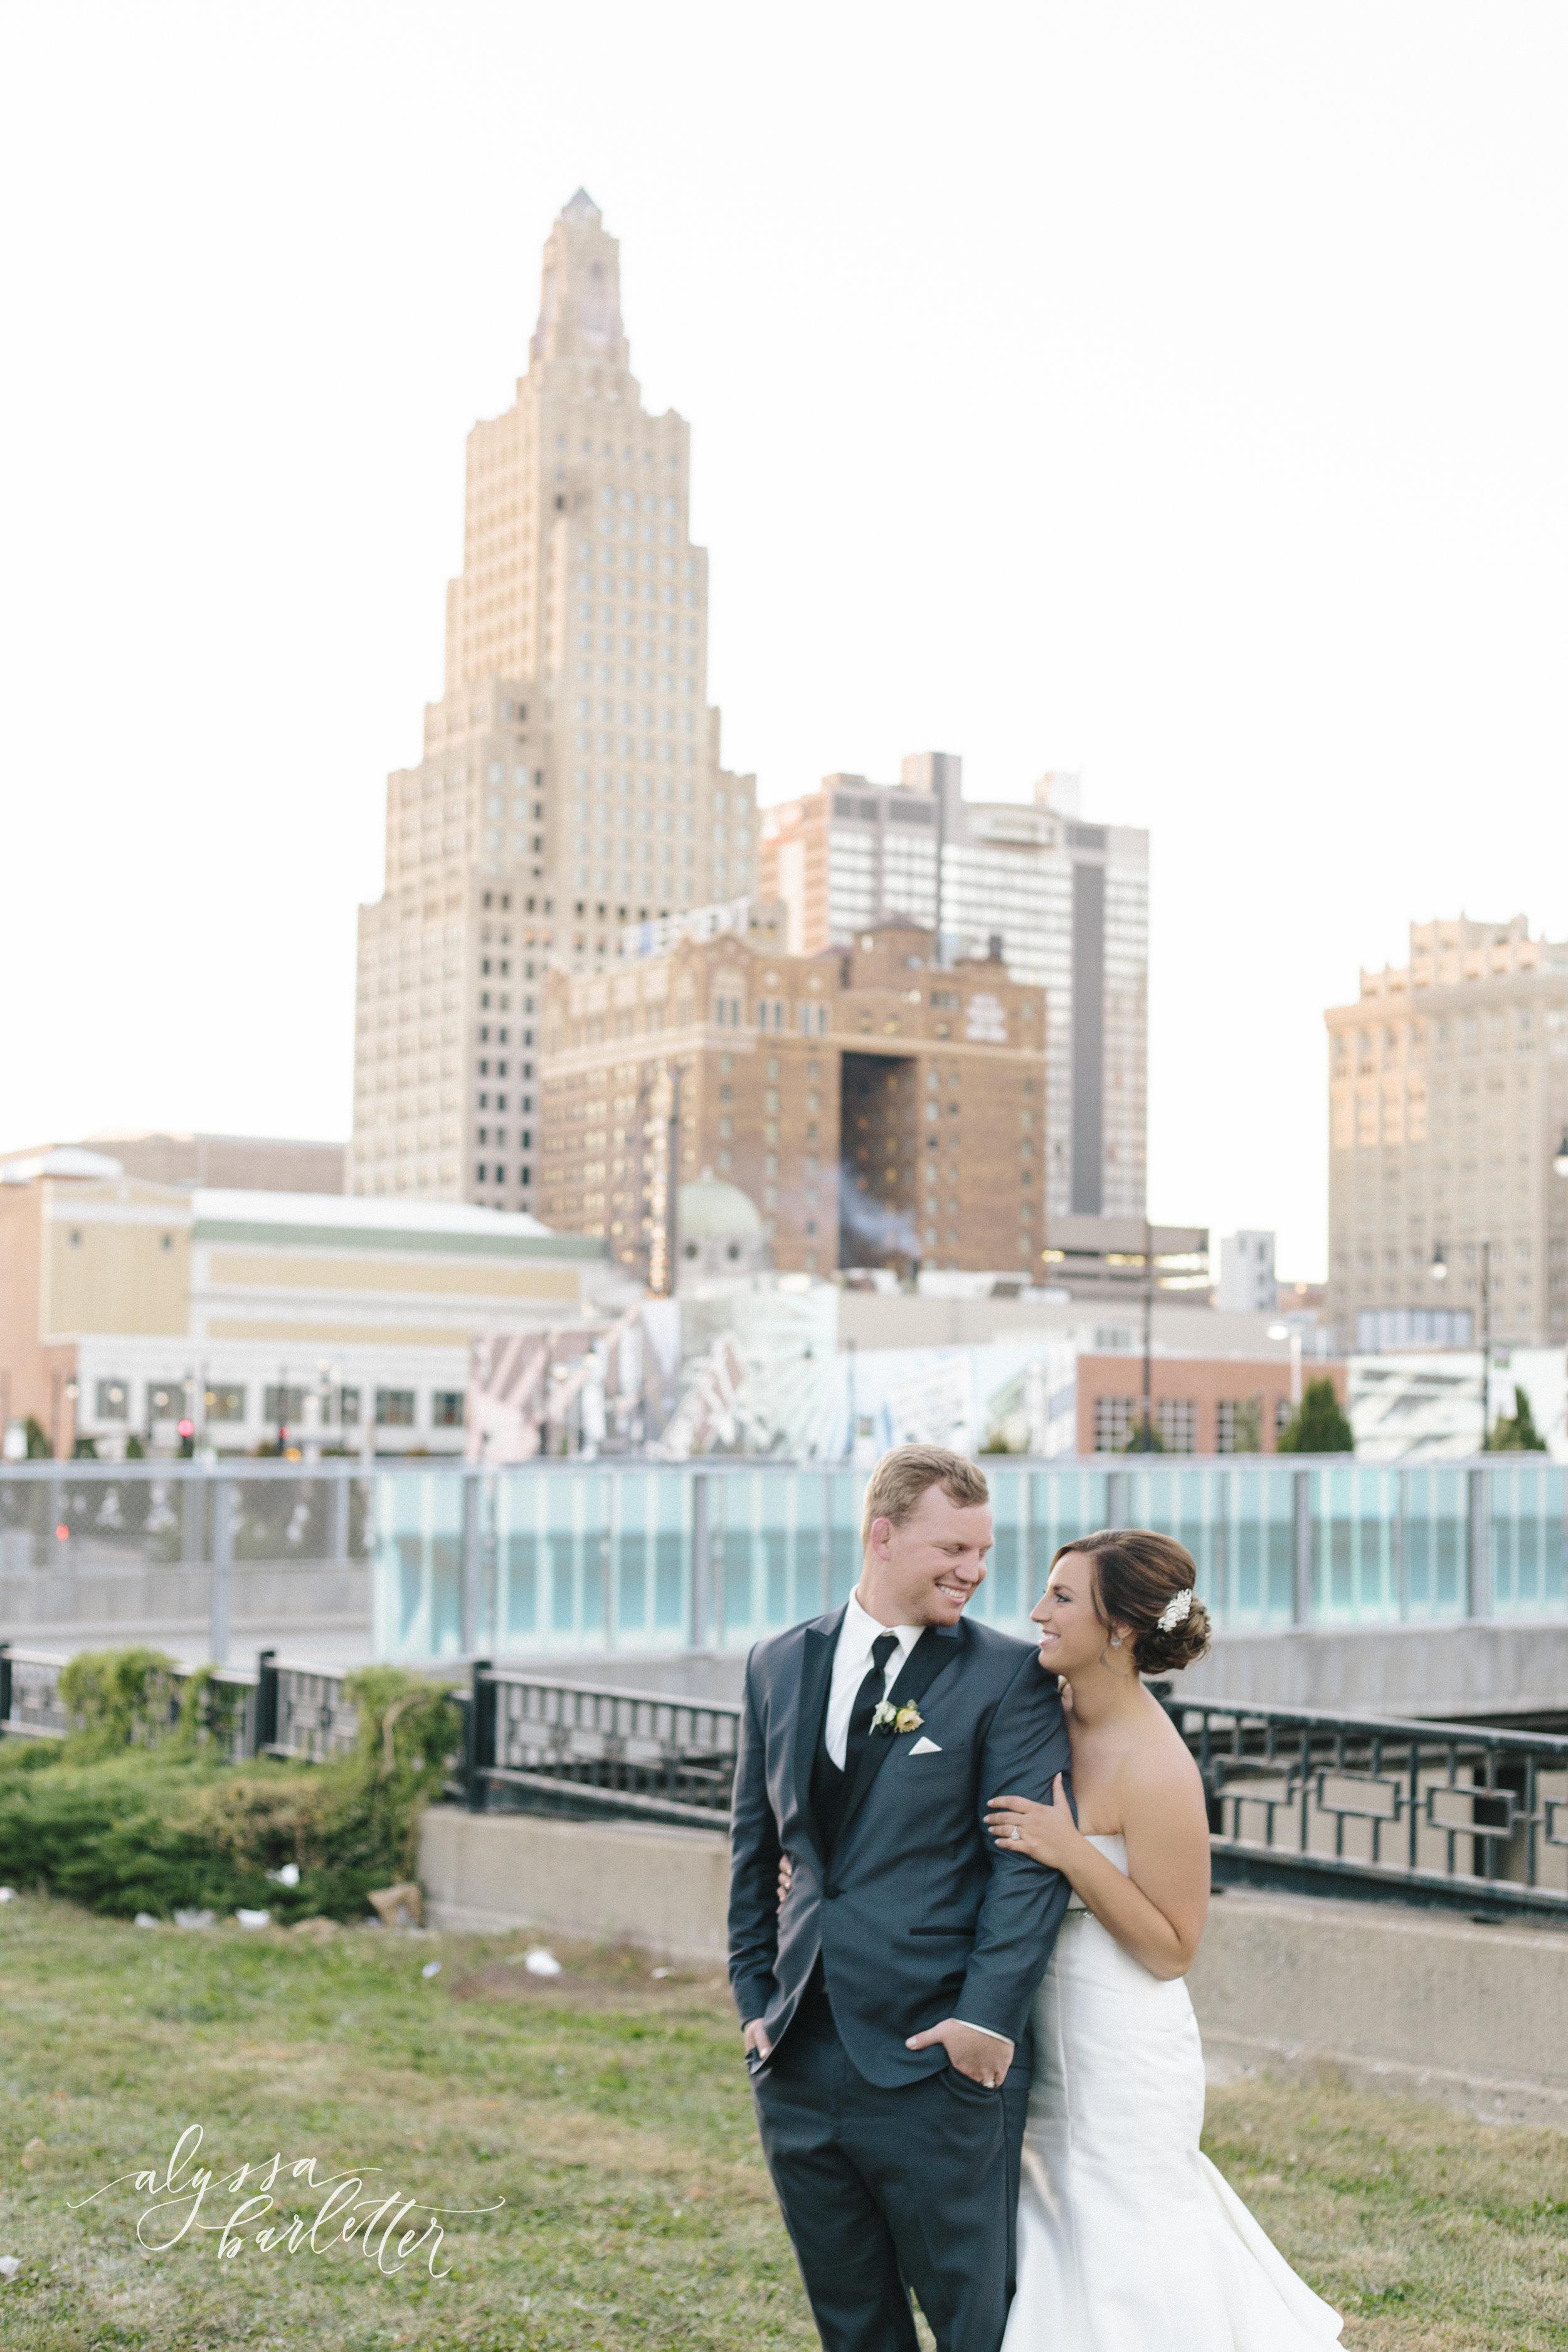 kansas city missouri wedding photographer downtown skyline bride groom